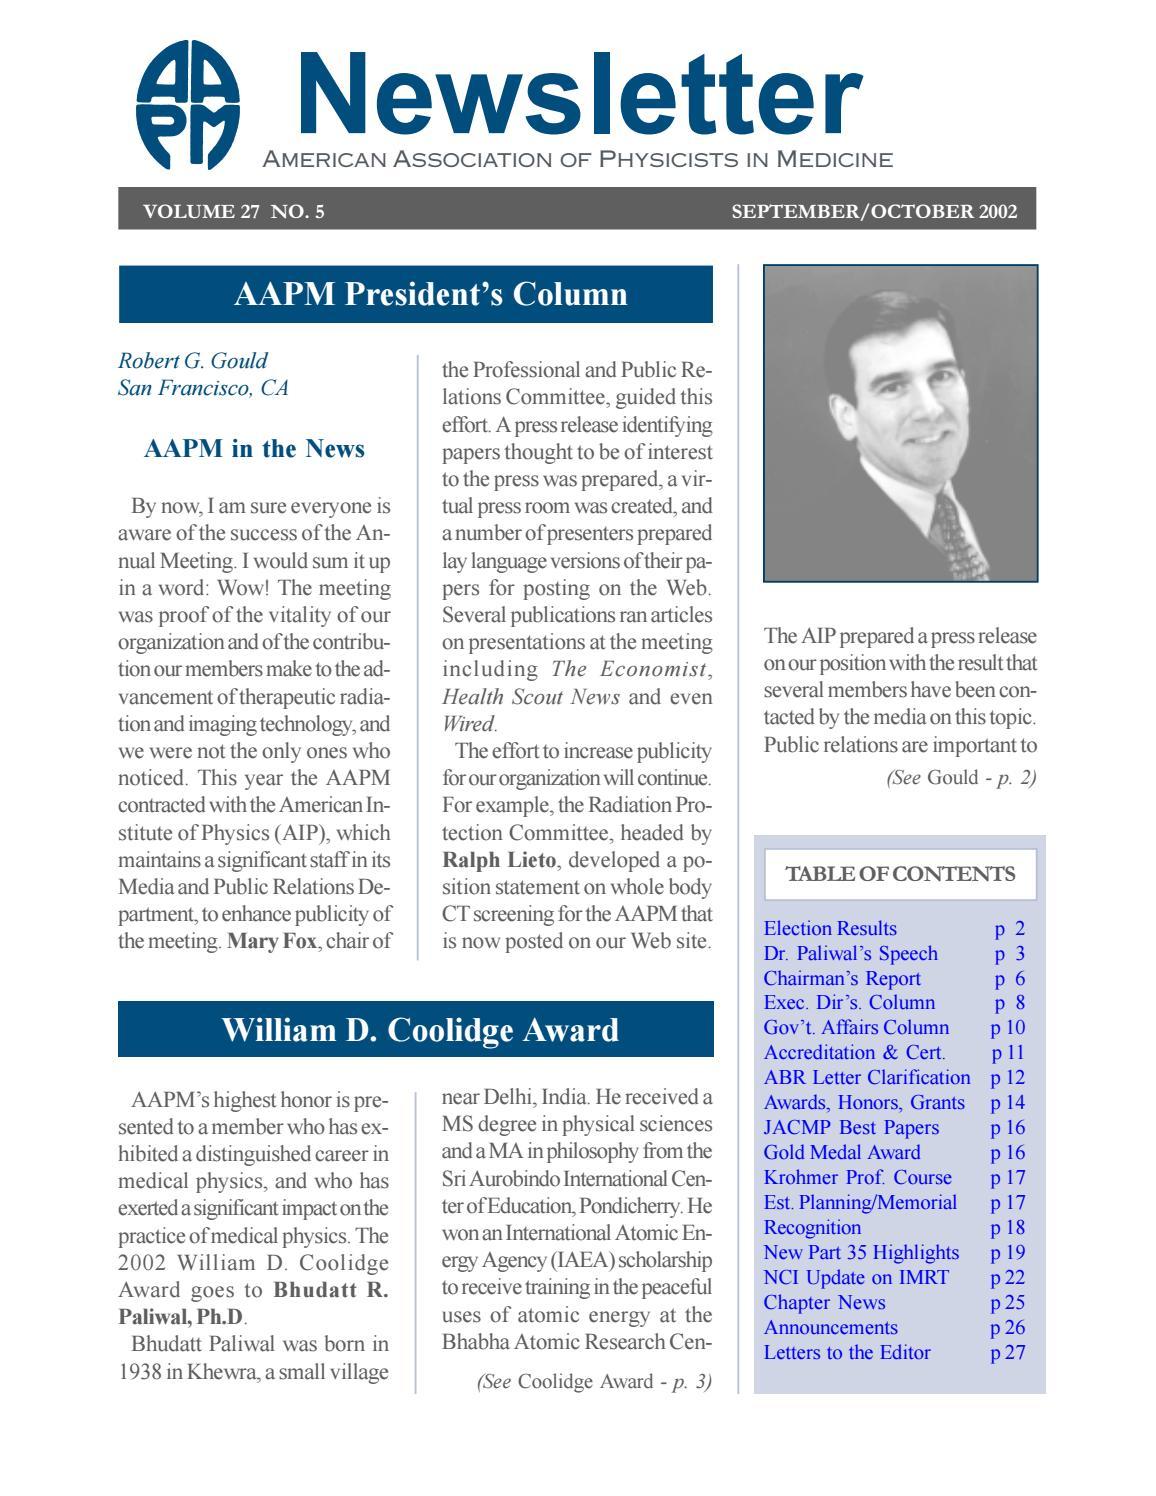 AAPM Newsletter September/October 2002 Vol  27 No  5 by